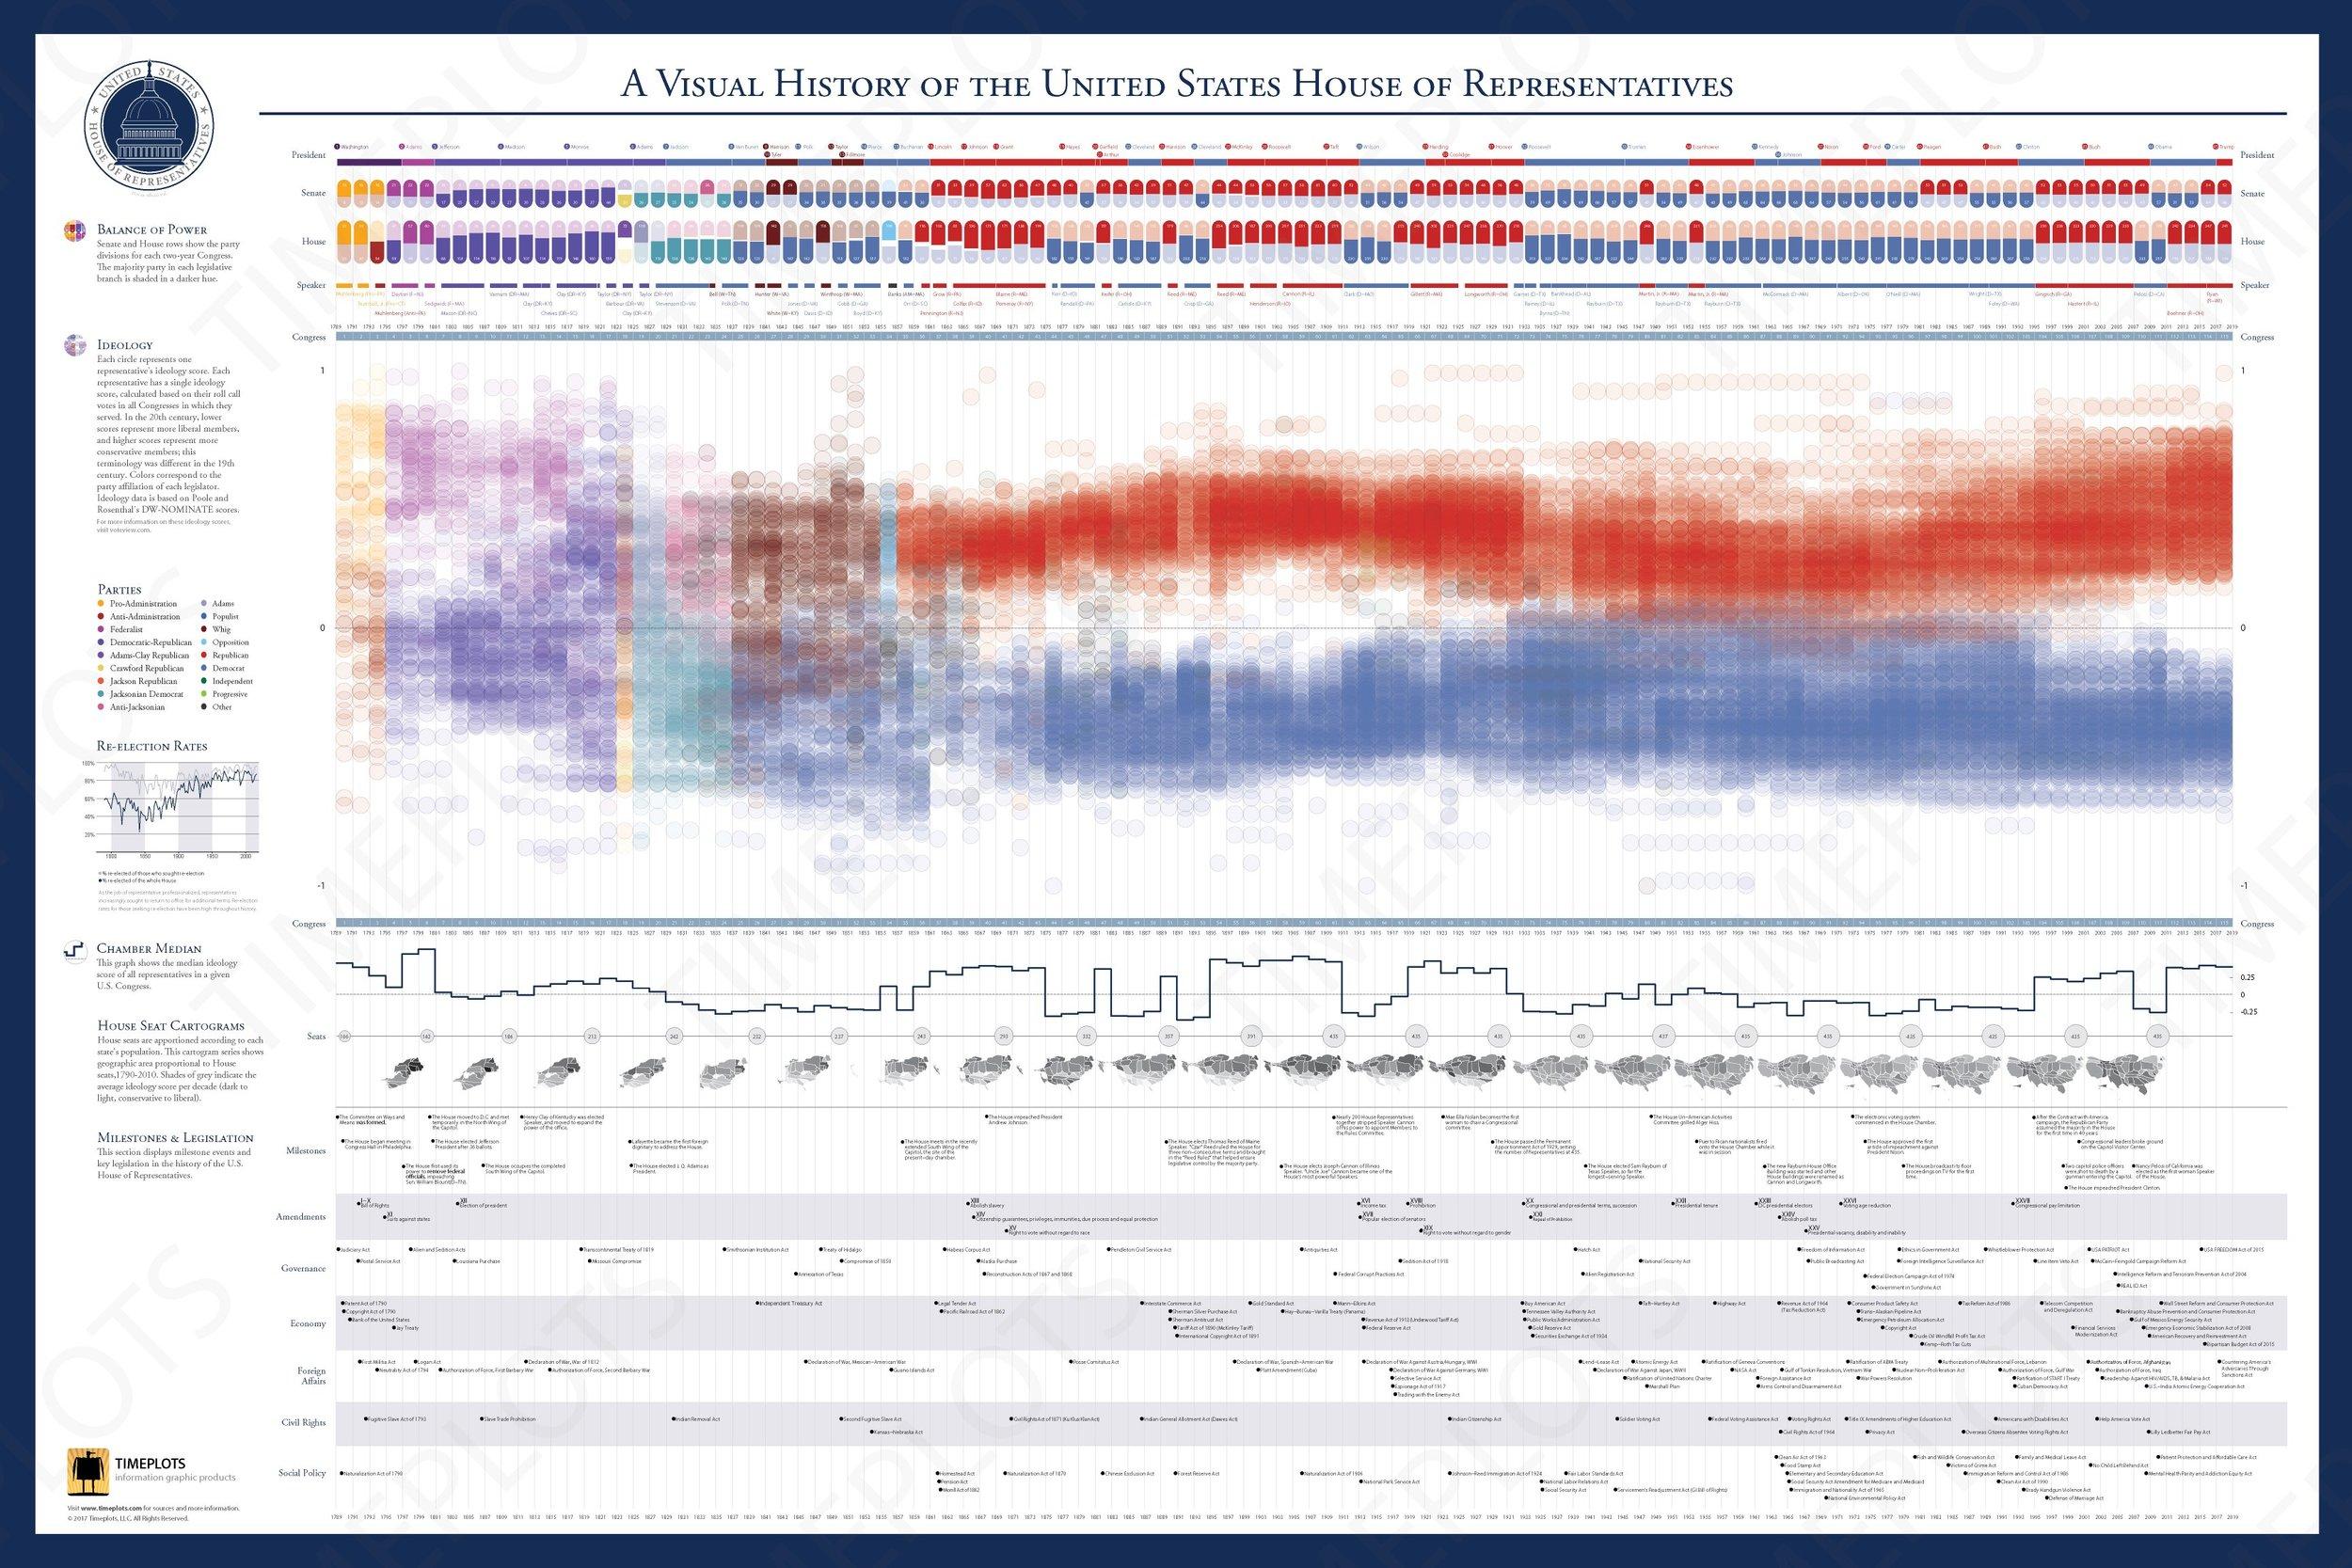 A Visual History of the U.S. House